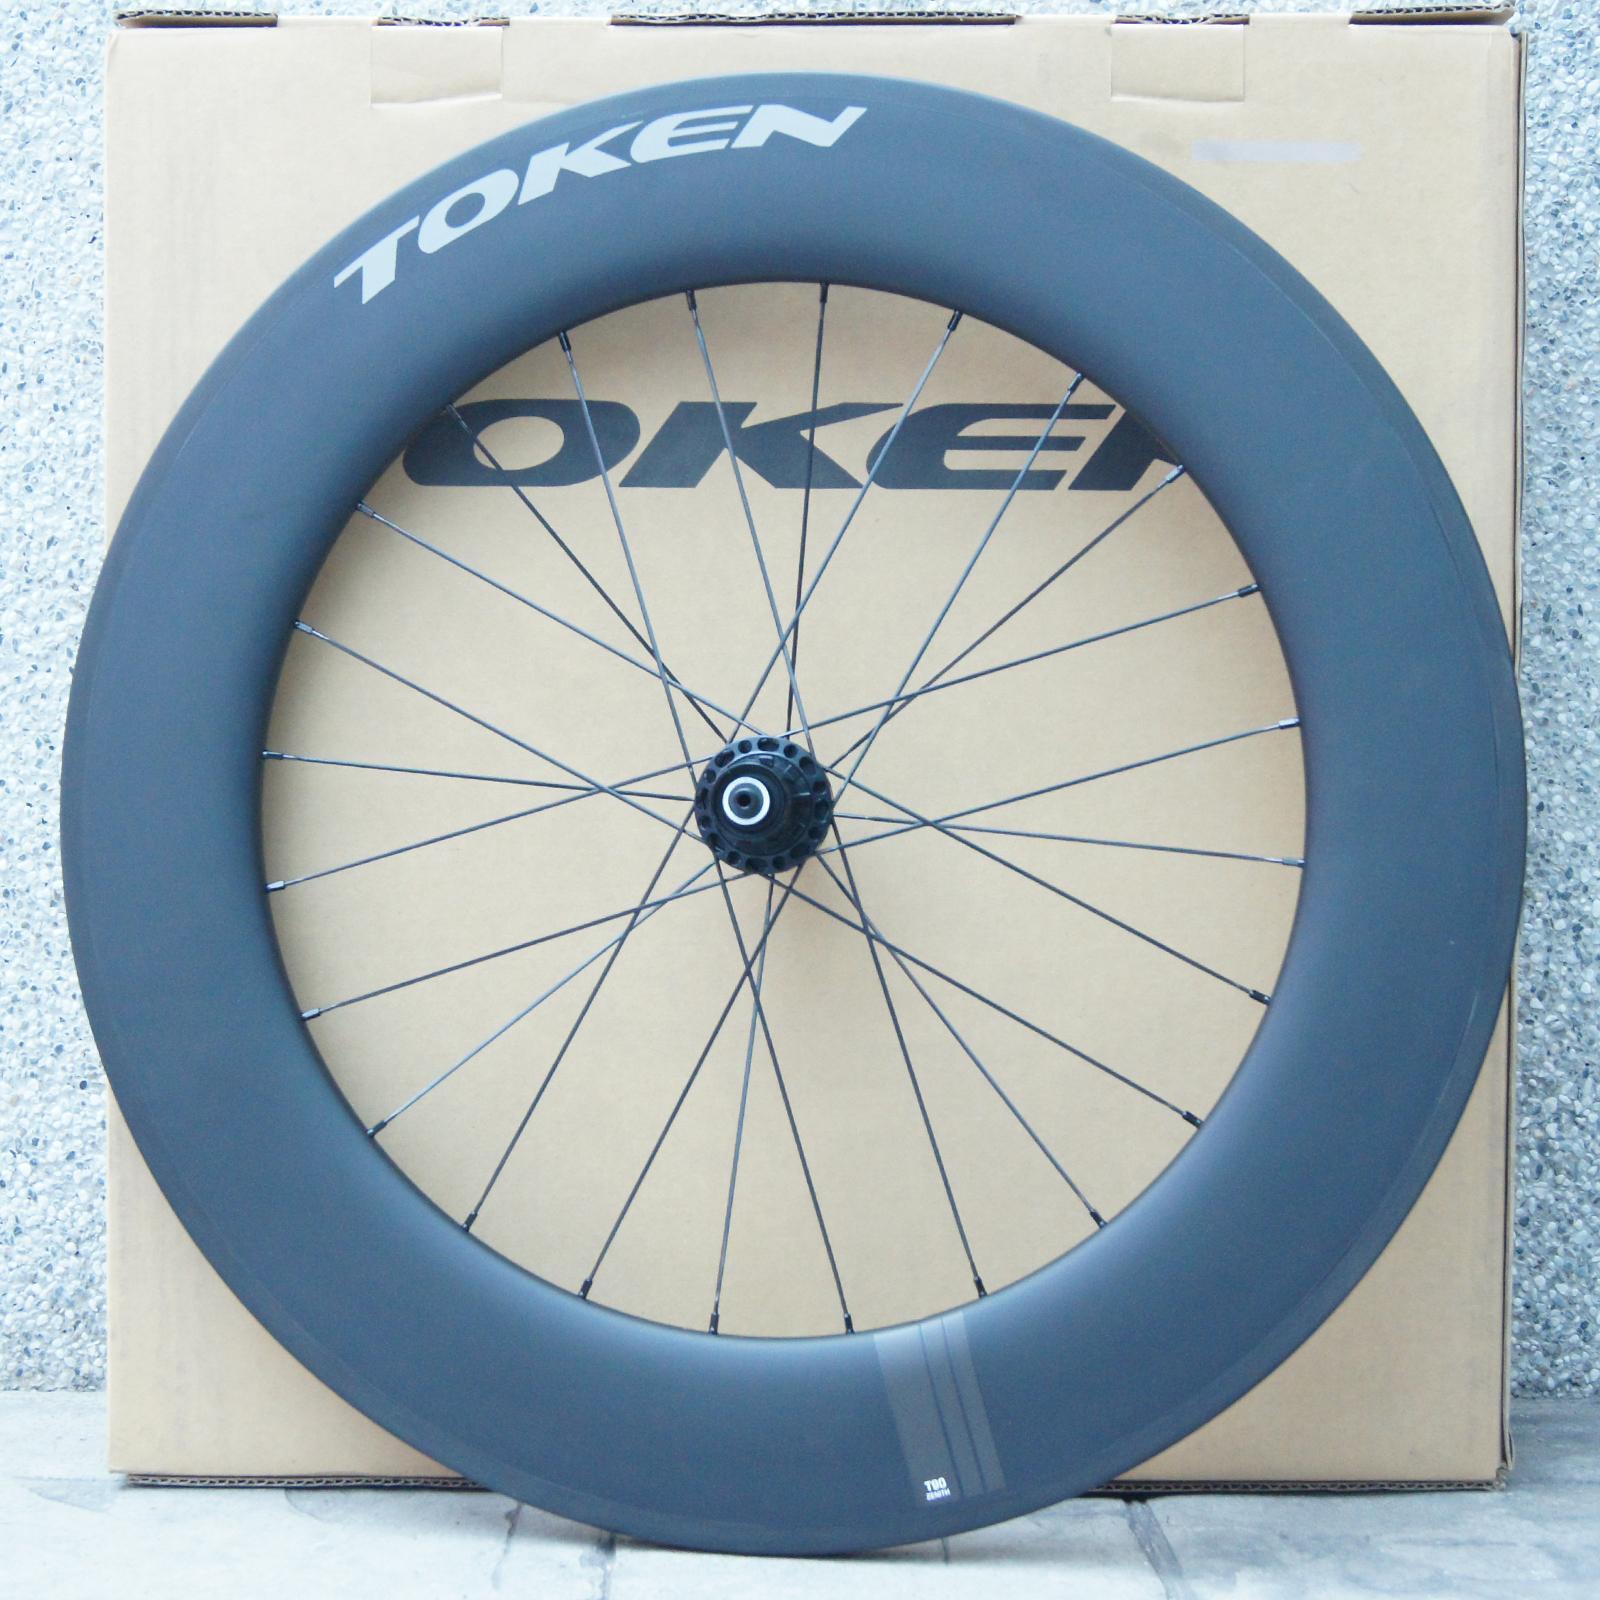 TOKEN T90 Tubular Carbon Wheel (Rear), Weight  896g